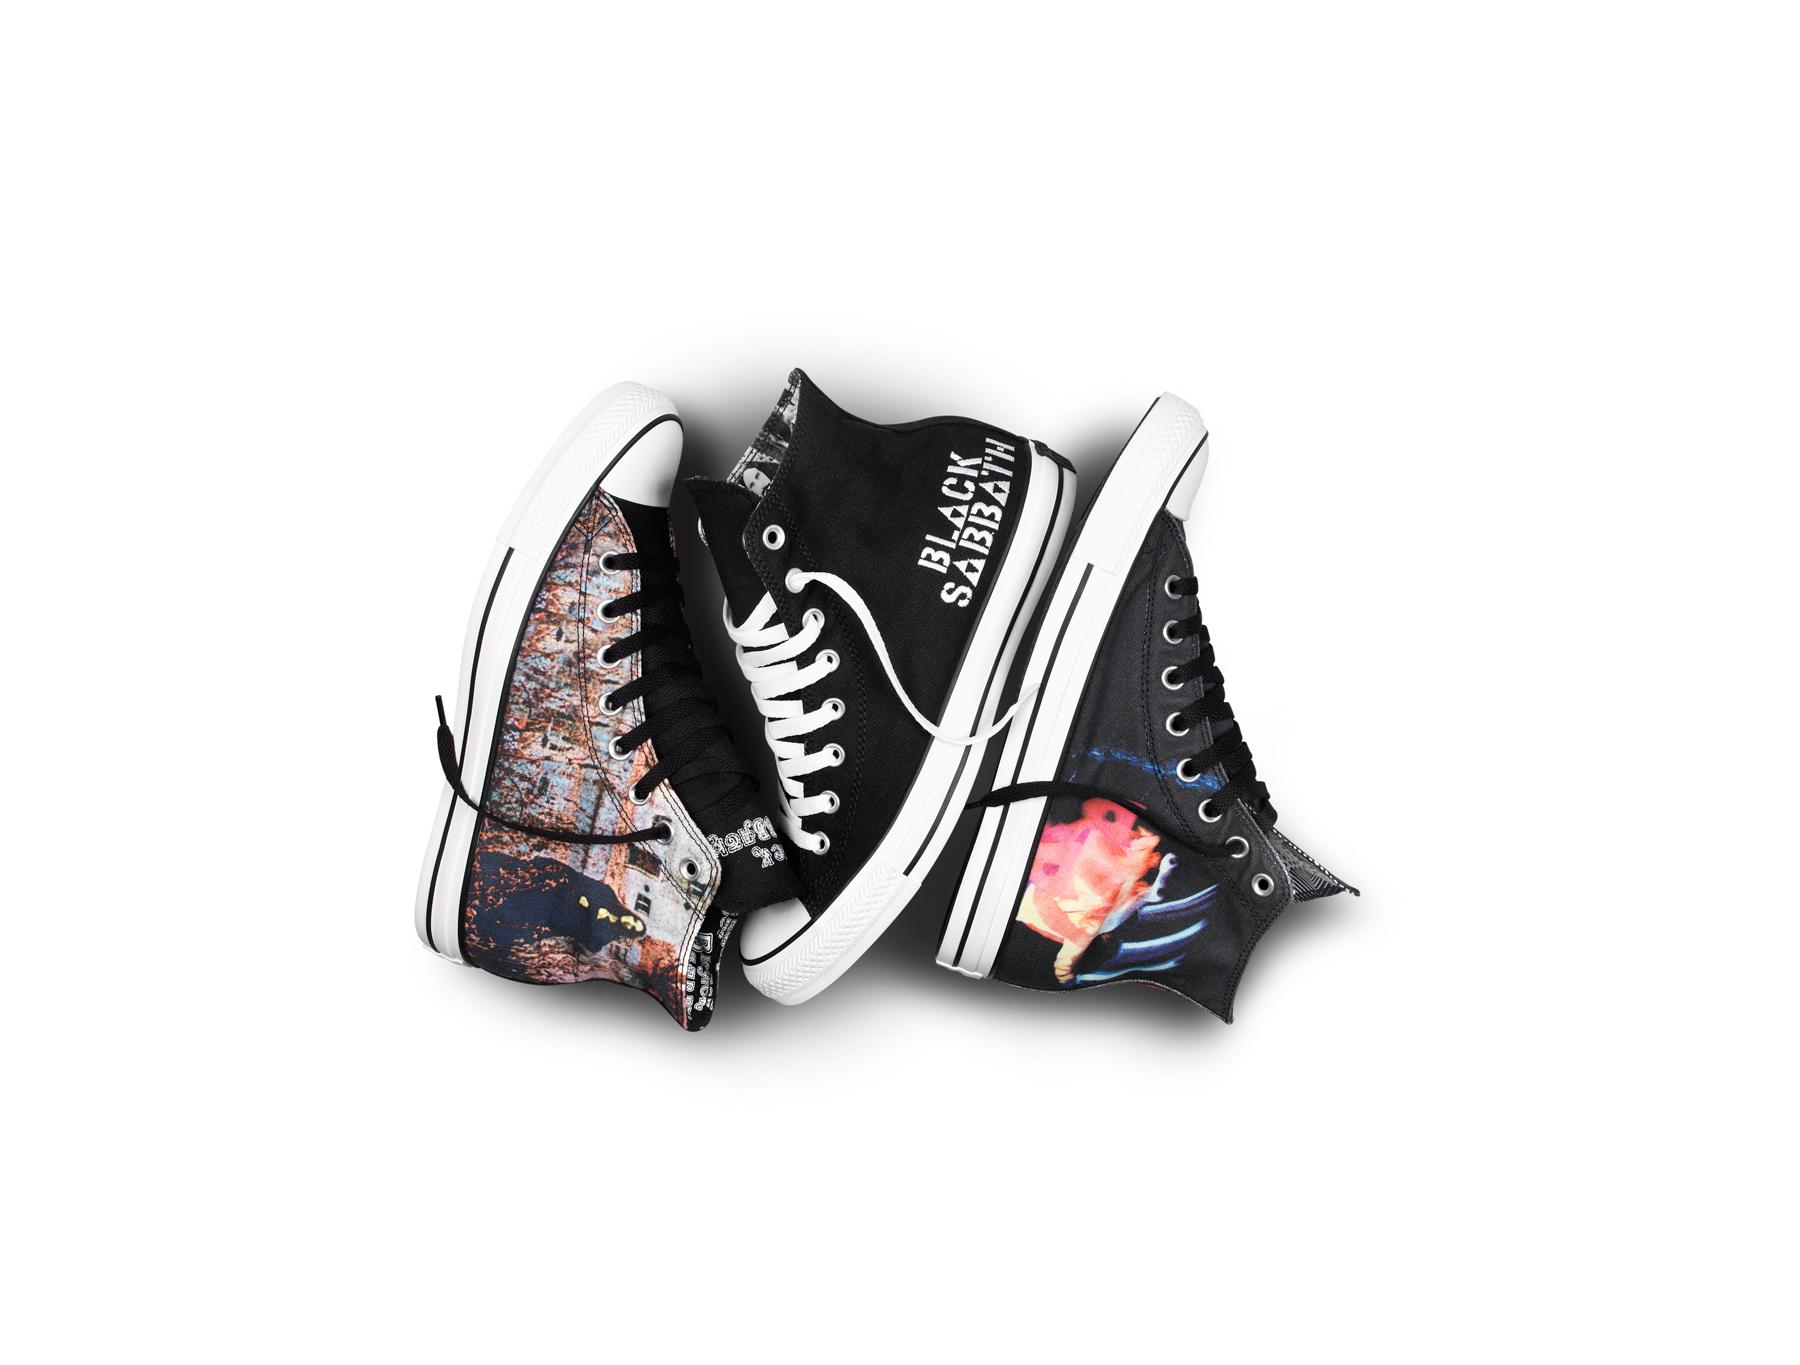 c5994791368c Converse Release Black Sabbath-Branded Chuck Taylors – Rolling Stone